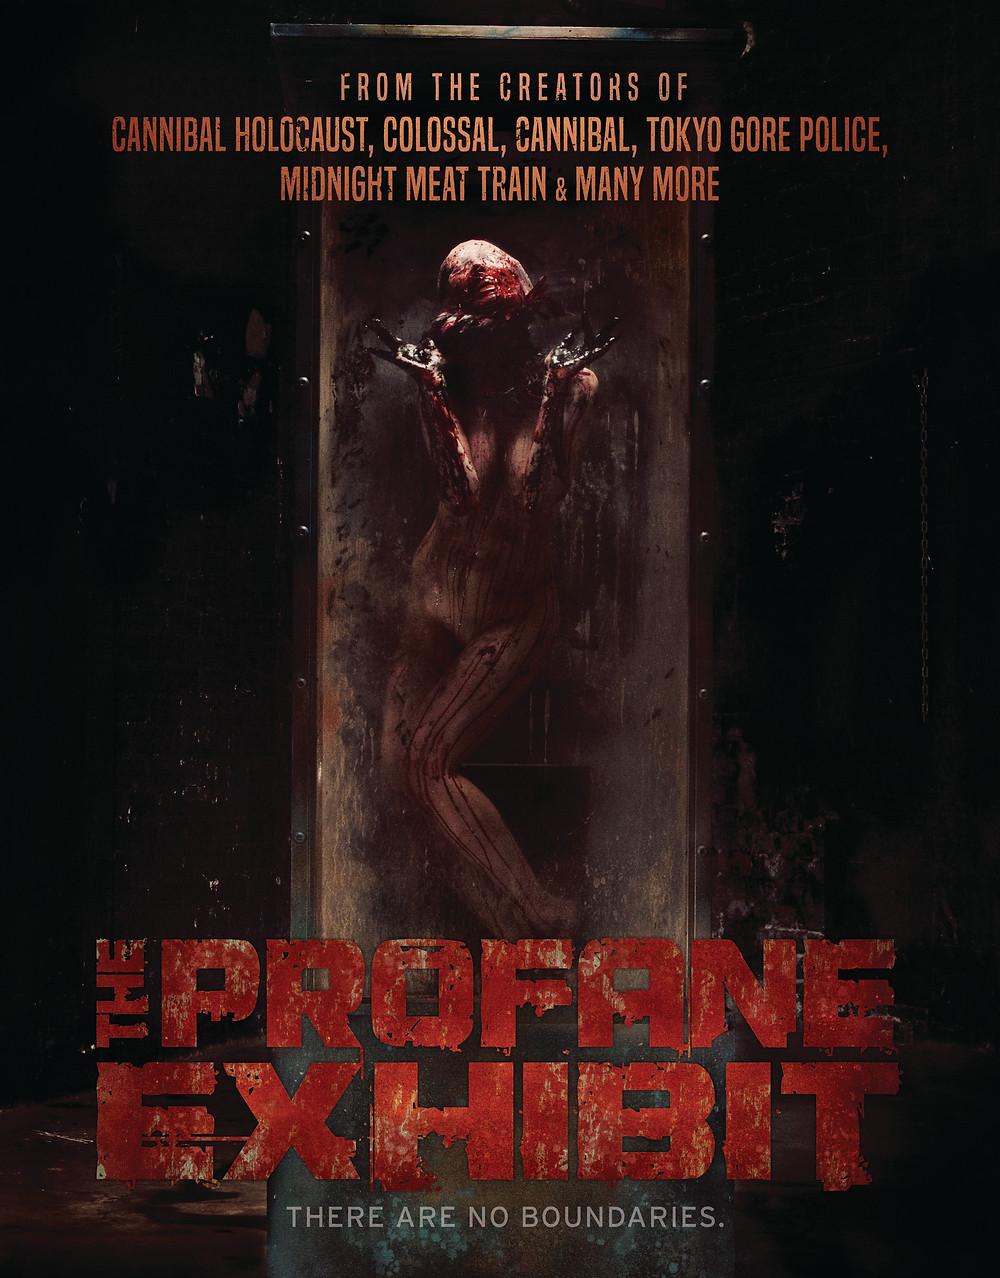 The Profane Exhibit Unearthed Films